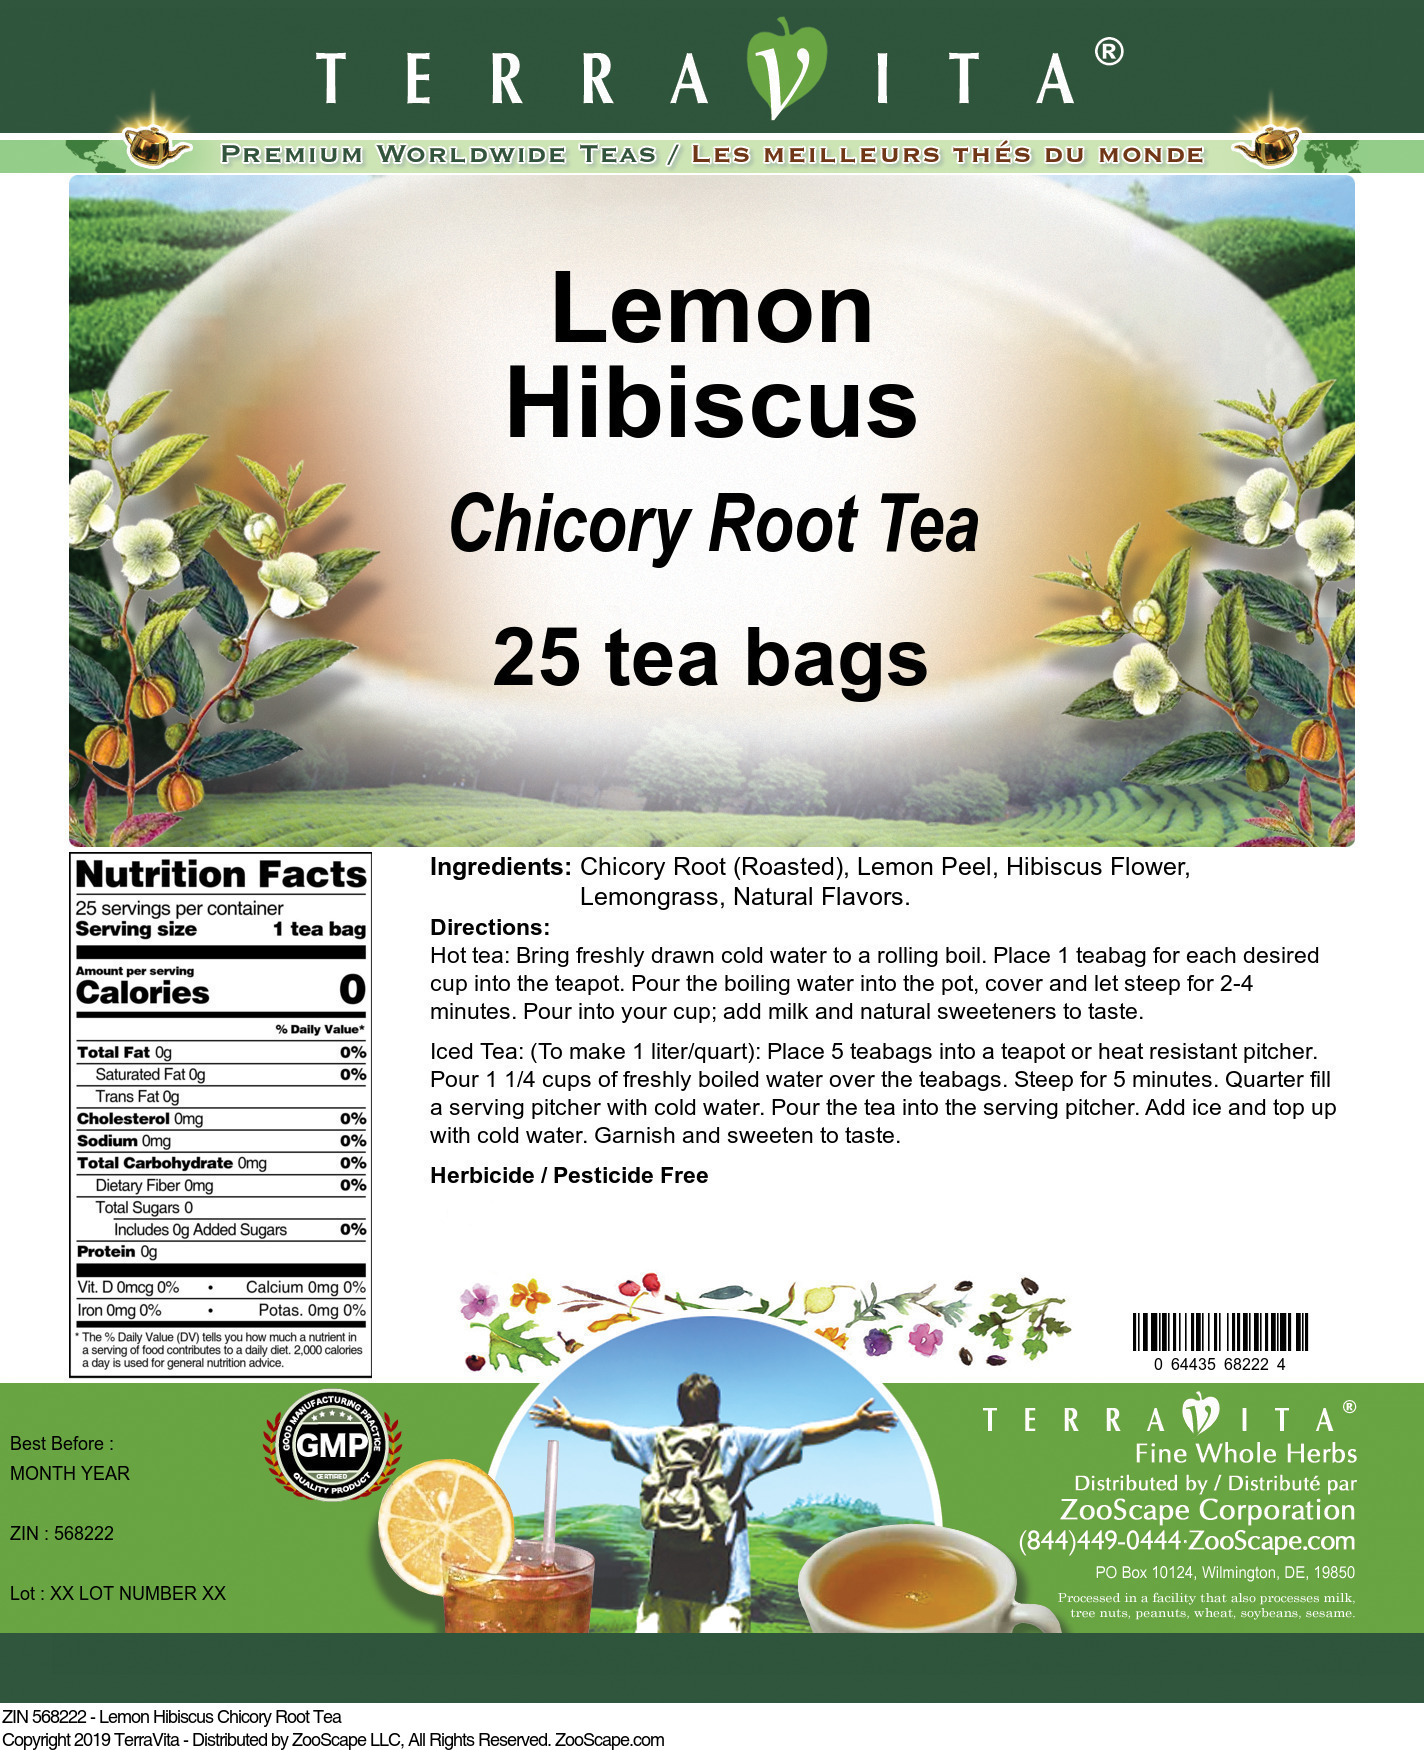 Lemon Hibiscus Chicory Root Tea